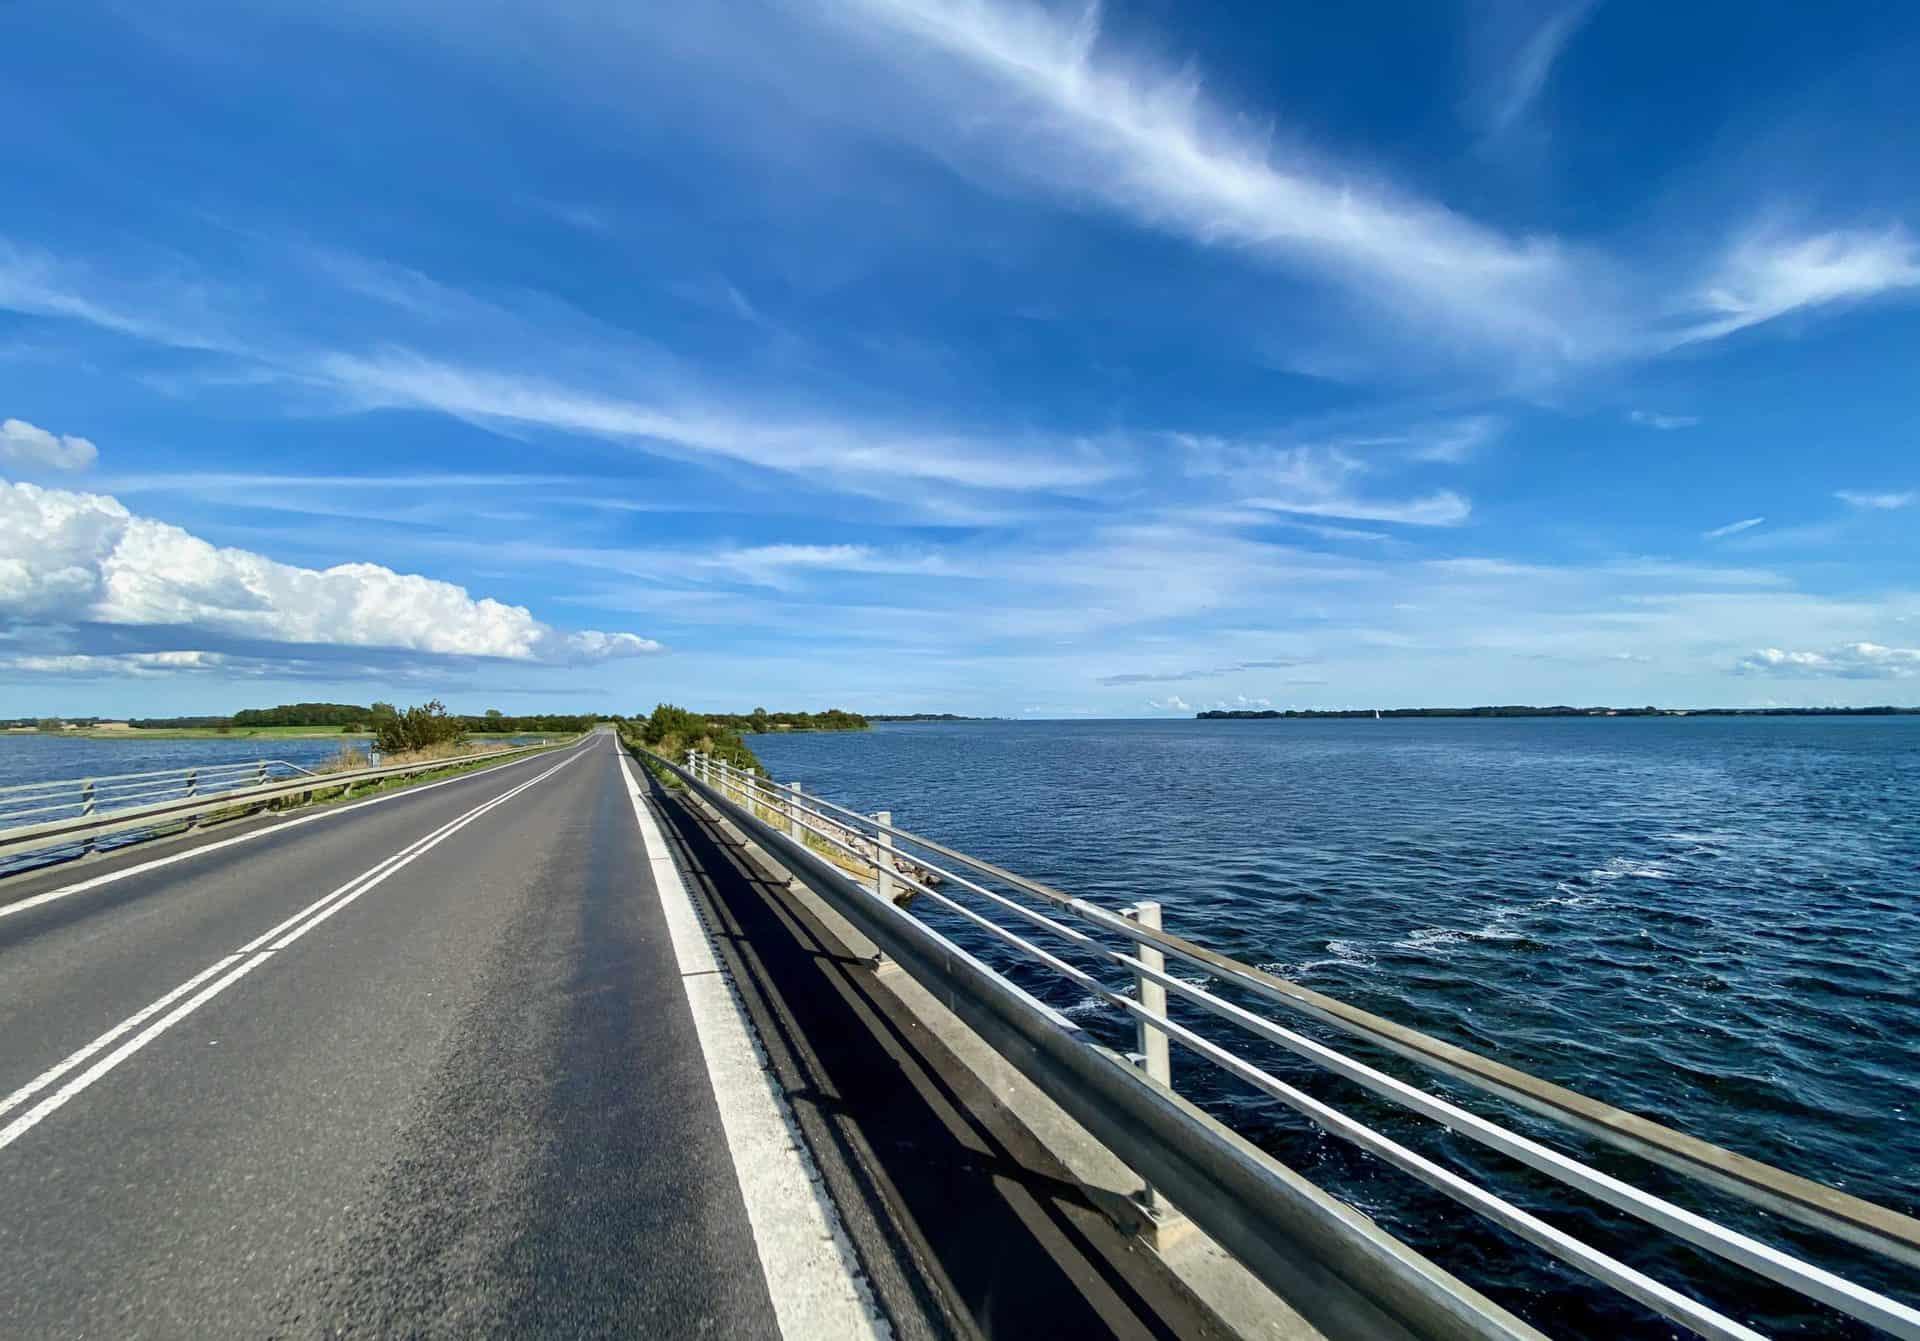 Reise-Wohnmobil-Daenemark-Fahrt-nach_Mons_Klint_Damm